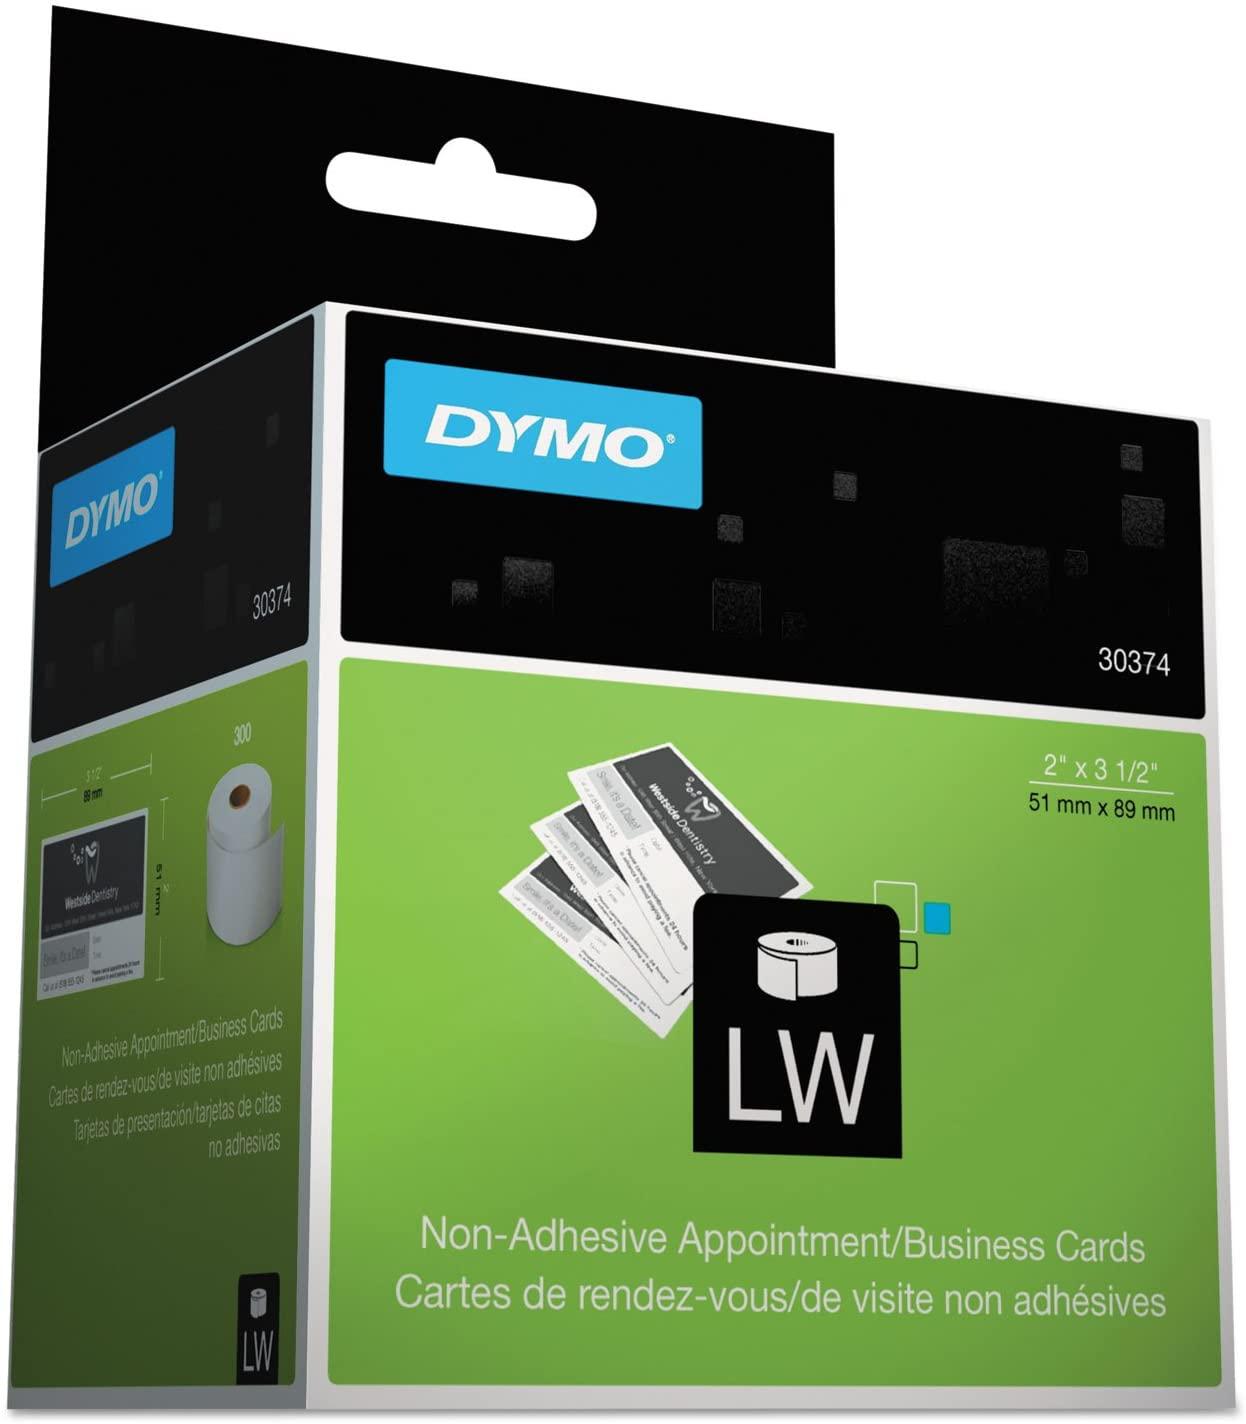 DYM30374 - Dymo Business Card